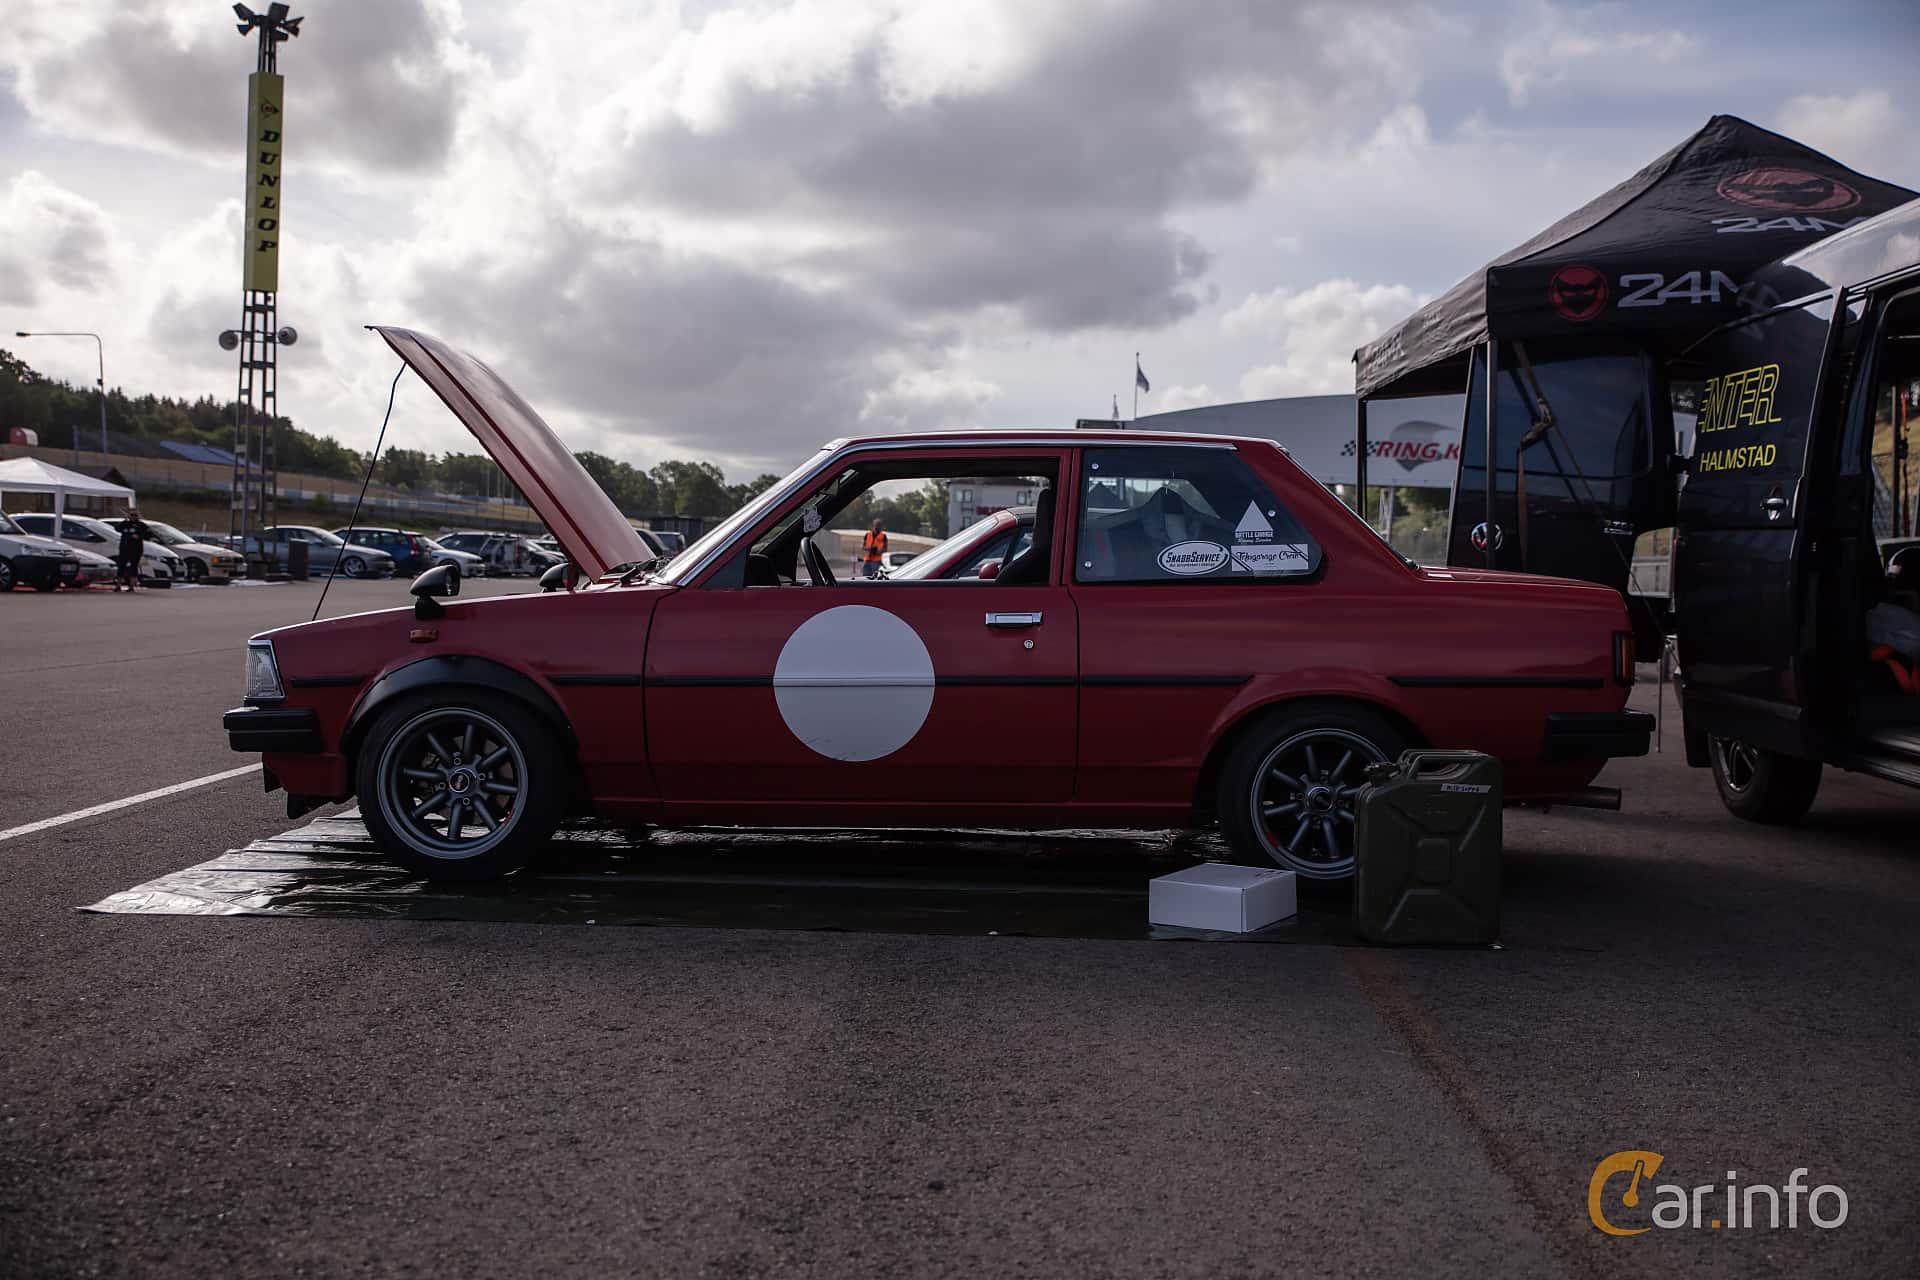 Toyota Corolla 2-door Sedan 1.3 Manual, 60hp, 1982 at JapTuning Trackday 2018 Knutstorp